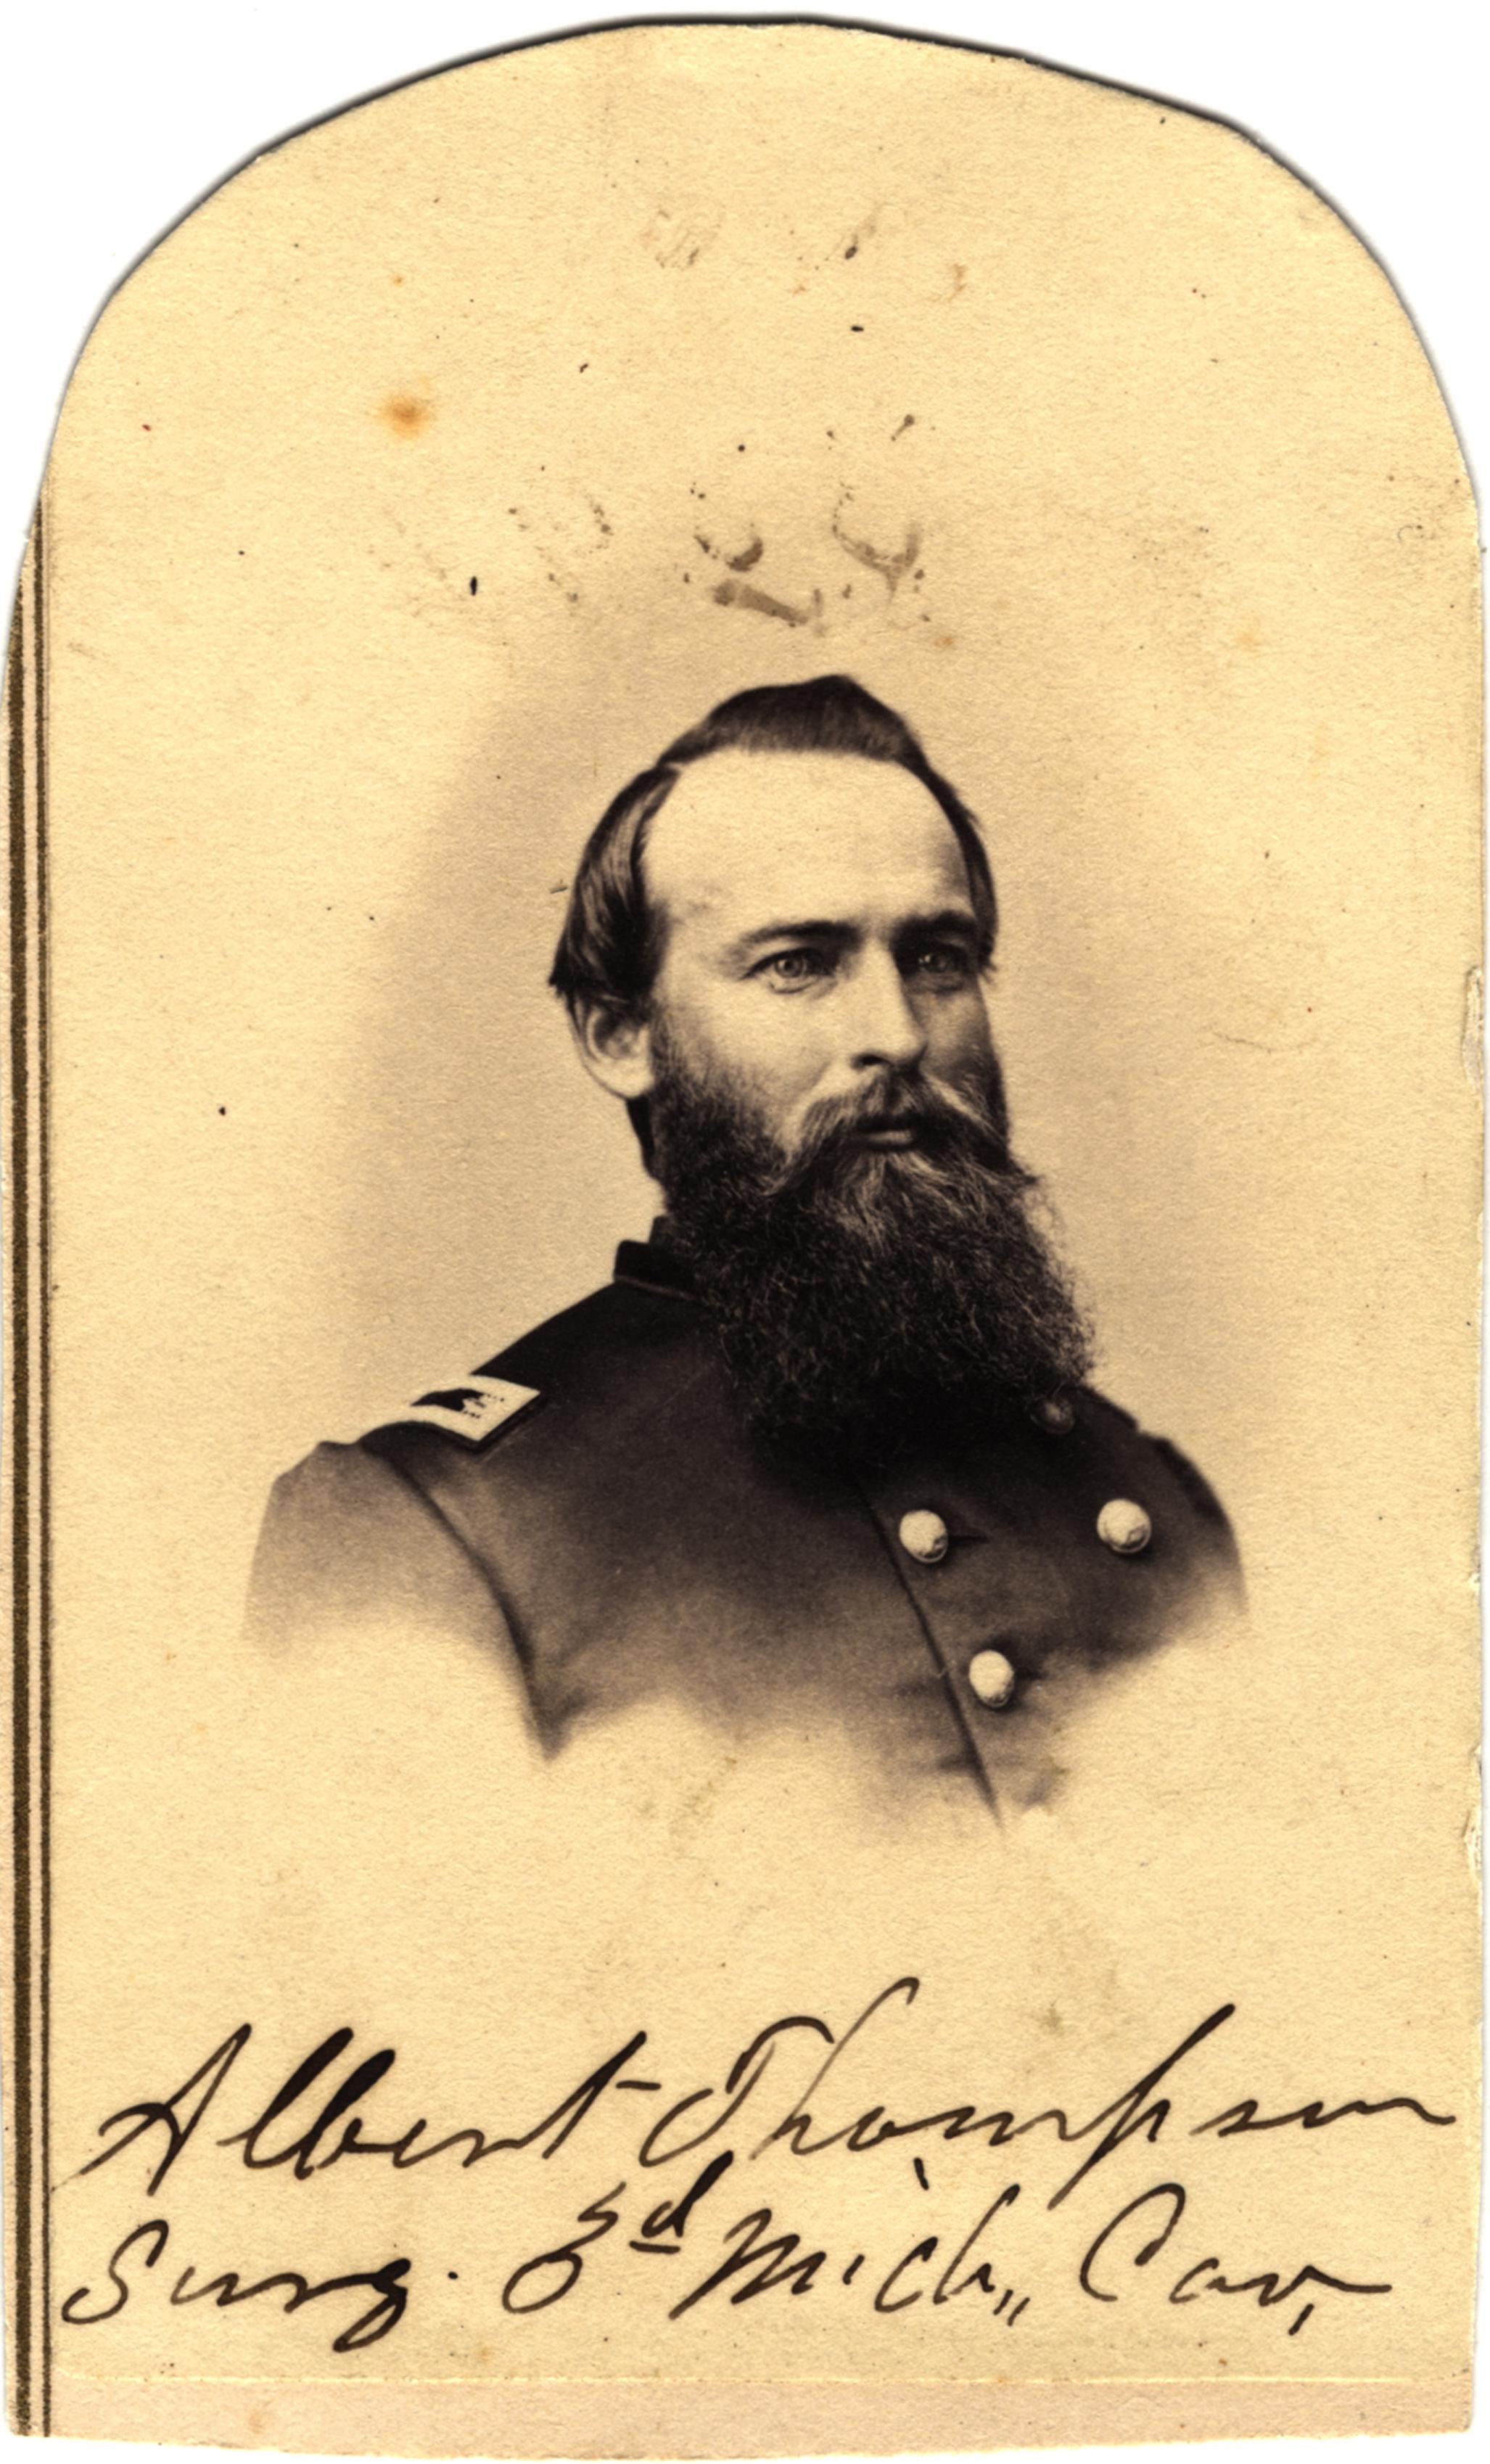 Albert H. Thompson, circa 1860s